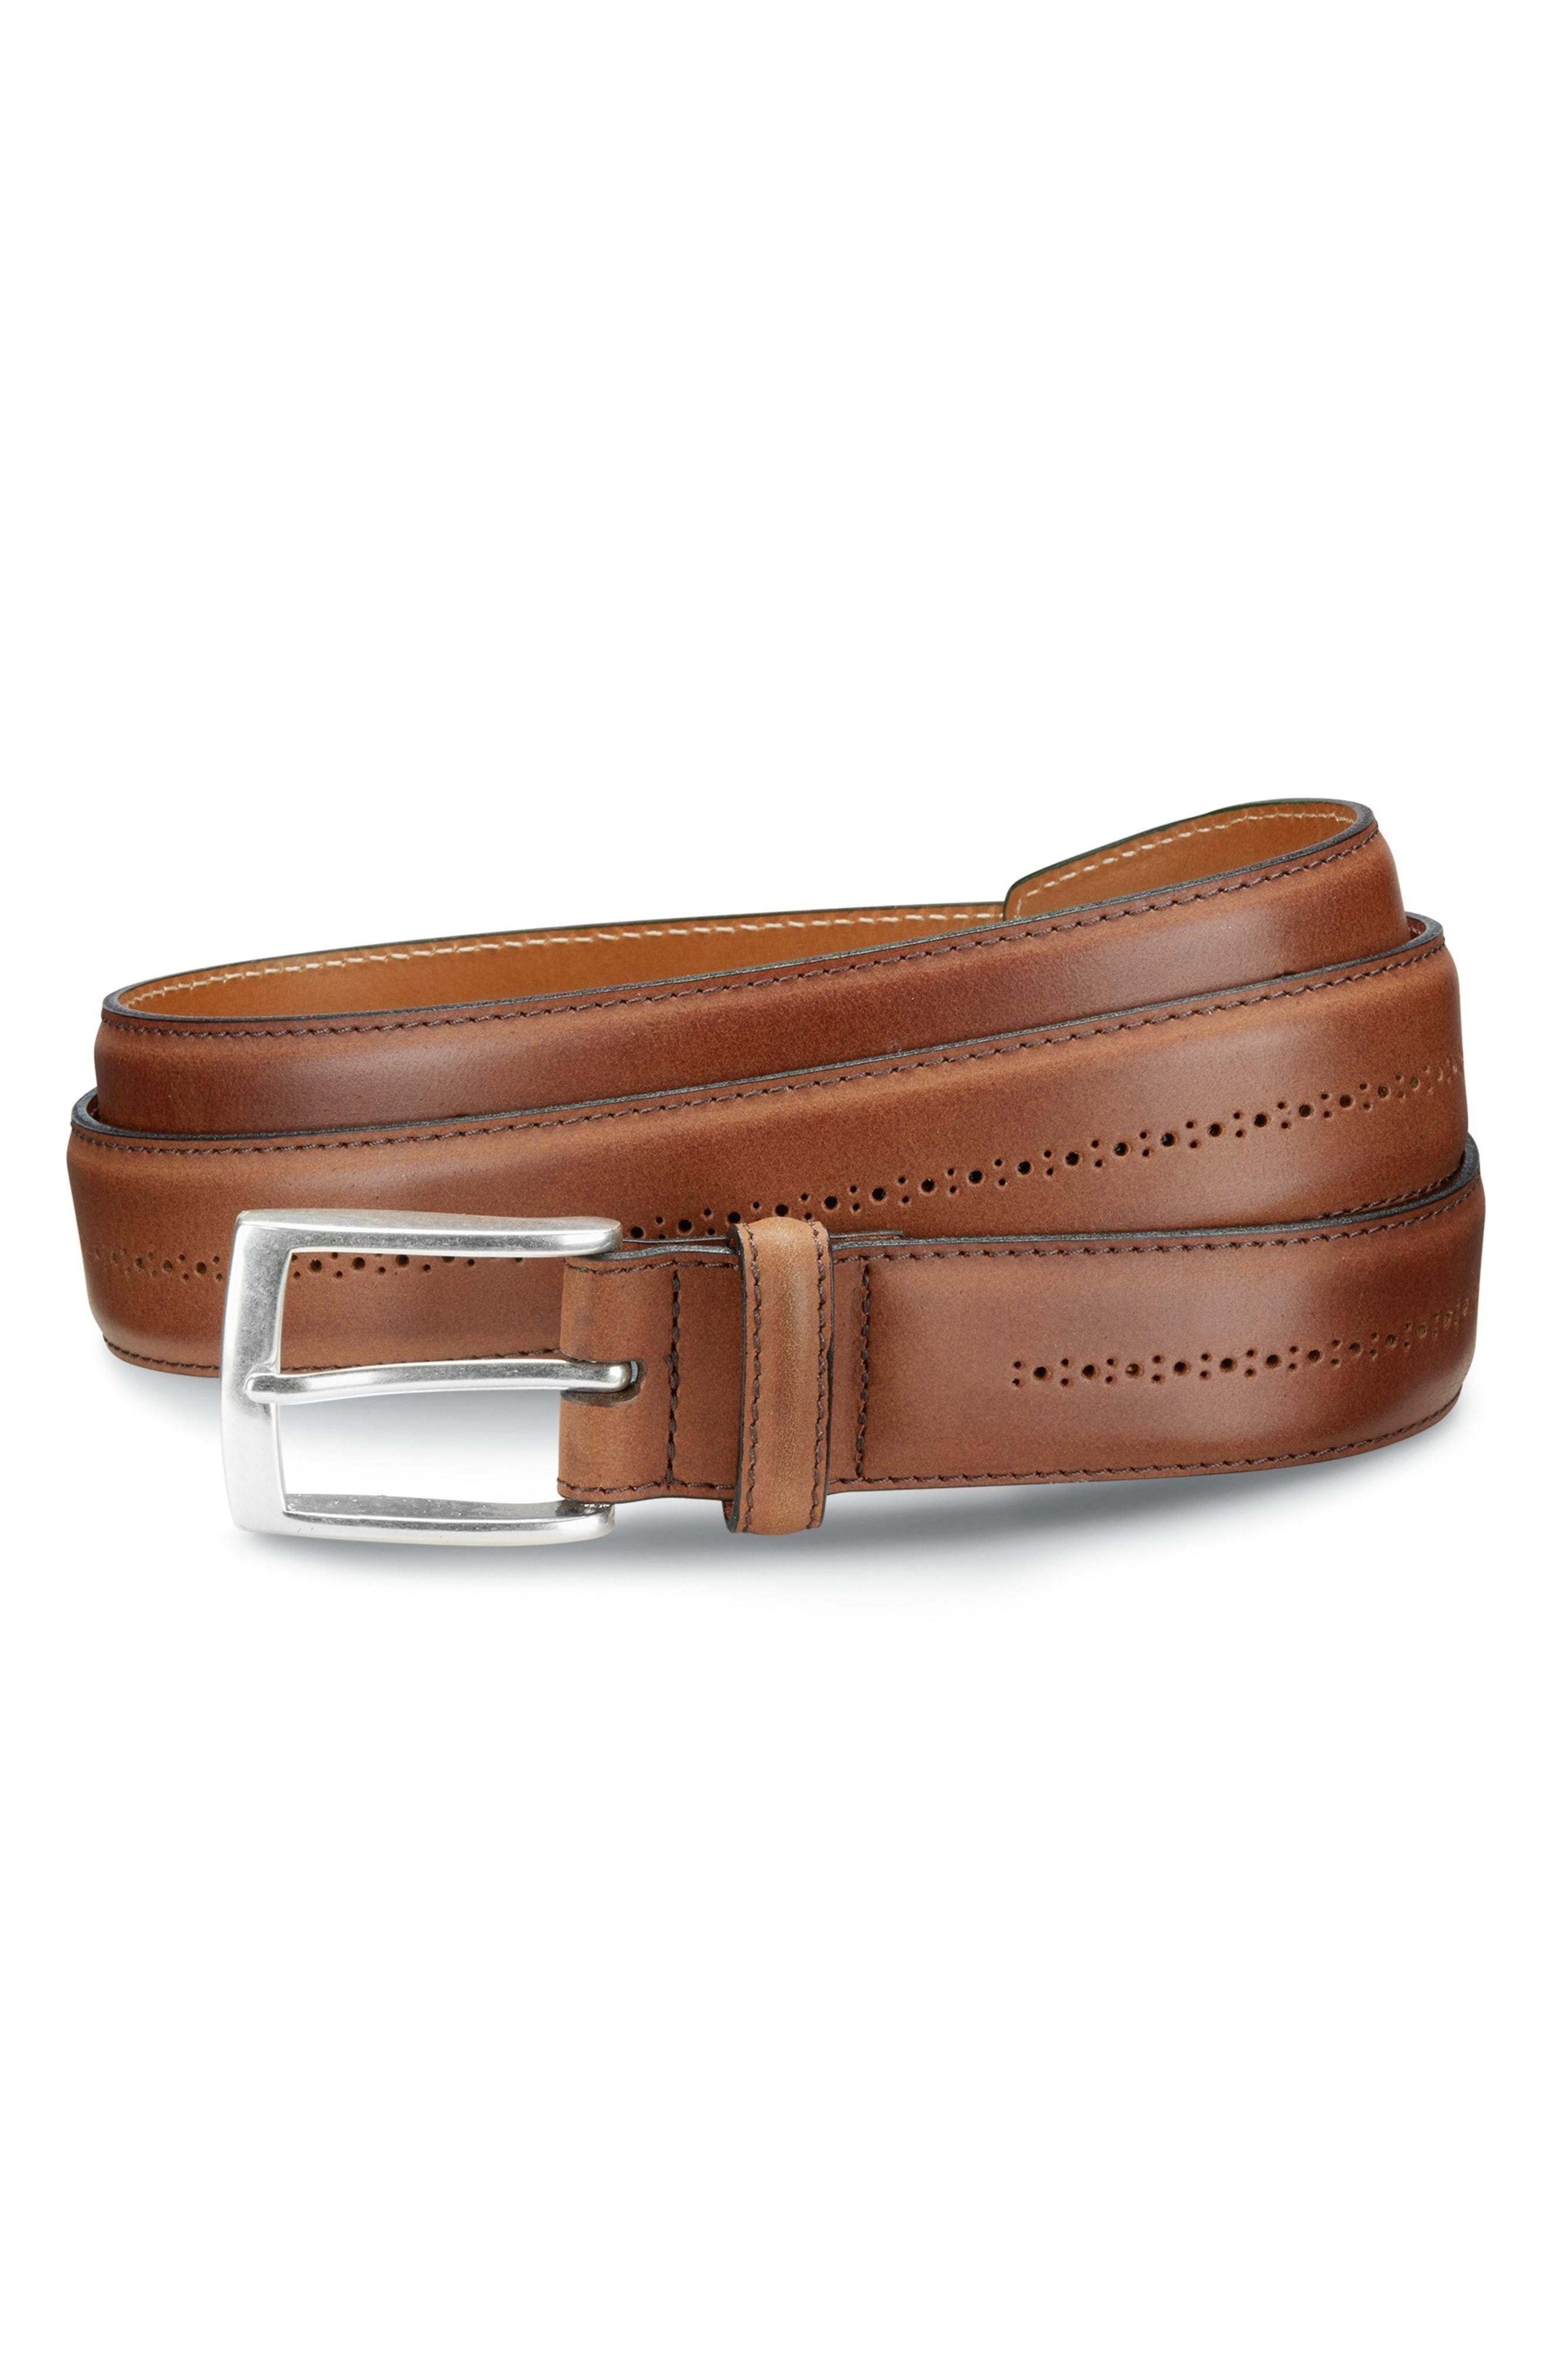 Allen Edmonds Mackey Ave Leather Belt